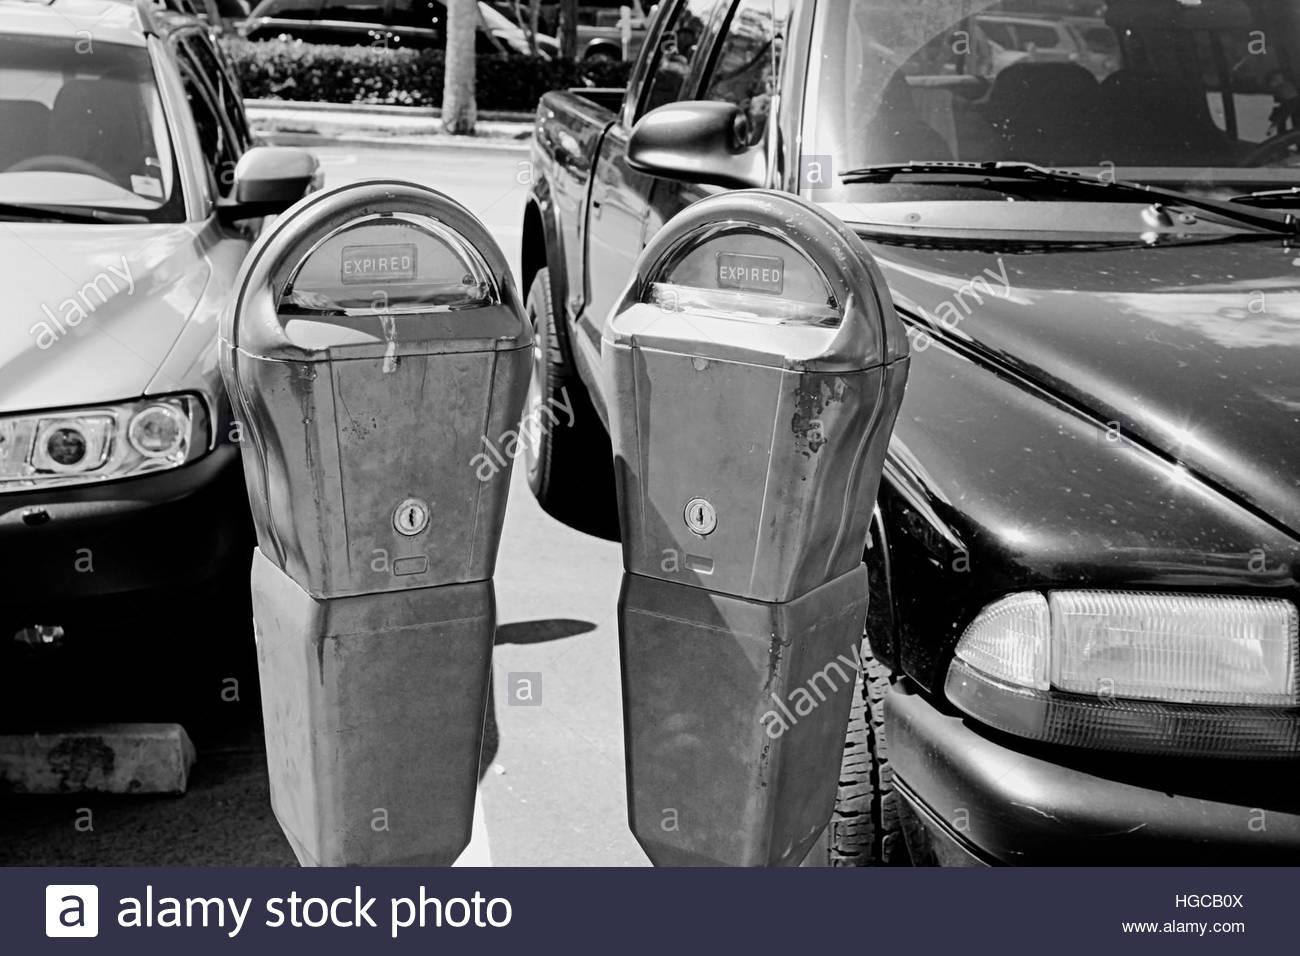 parking meters expired black white - Stock Image